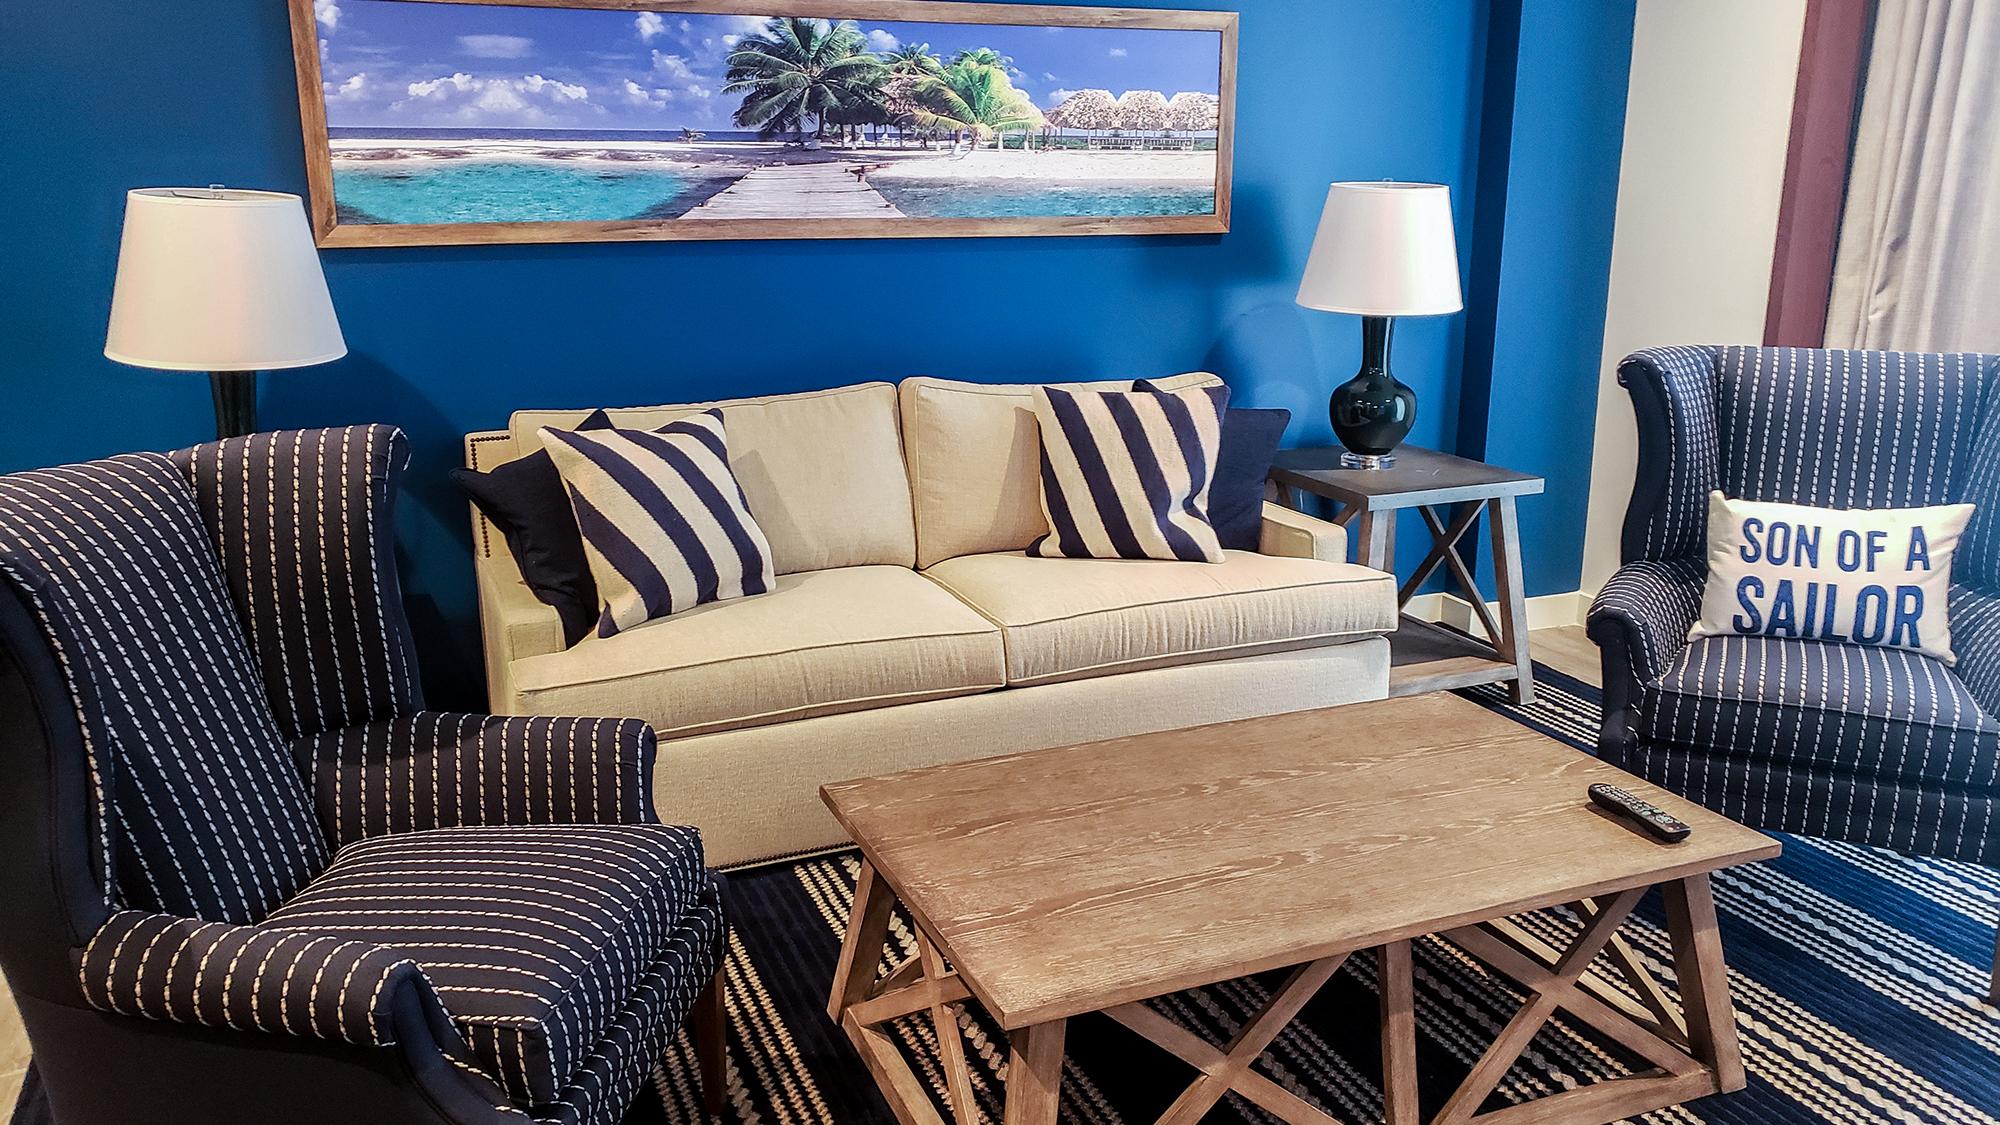 Margaritaville Resort brings island stylin' to Orlando